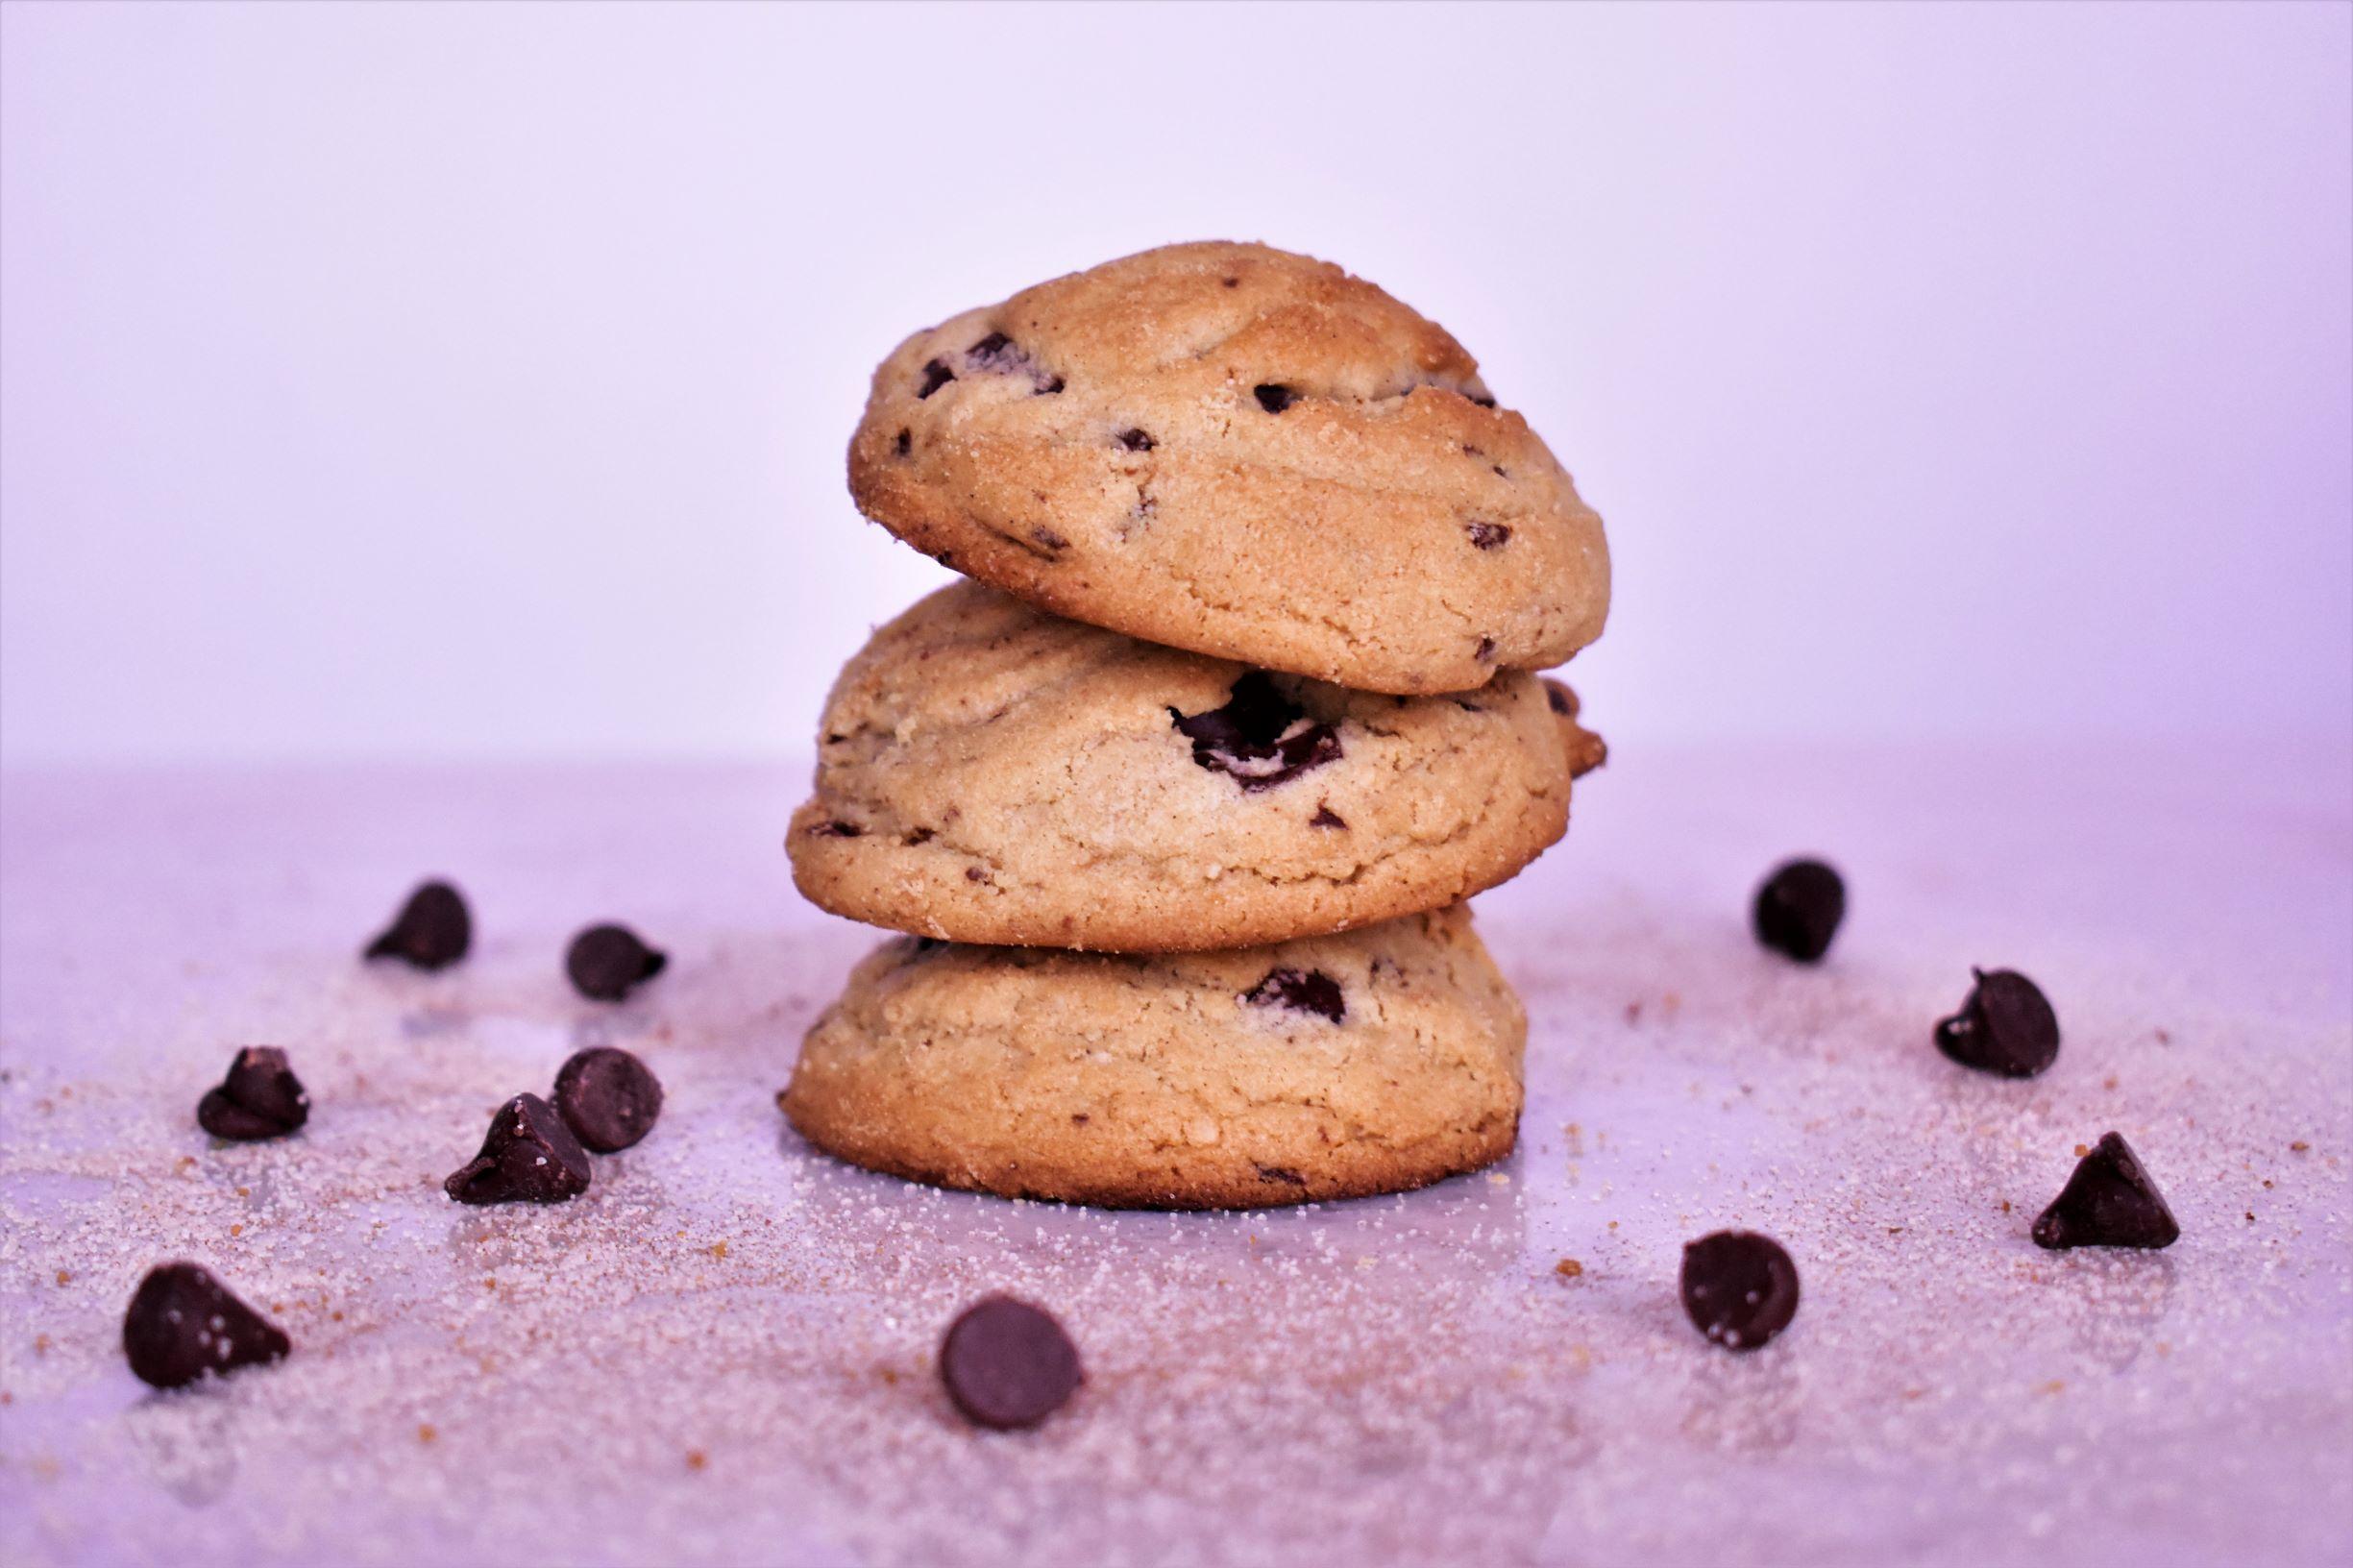 Sweetie Magic Chocolate Chip Cookies